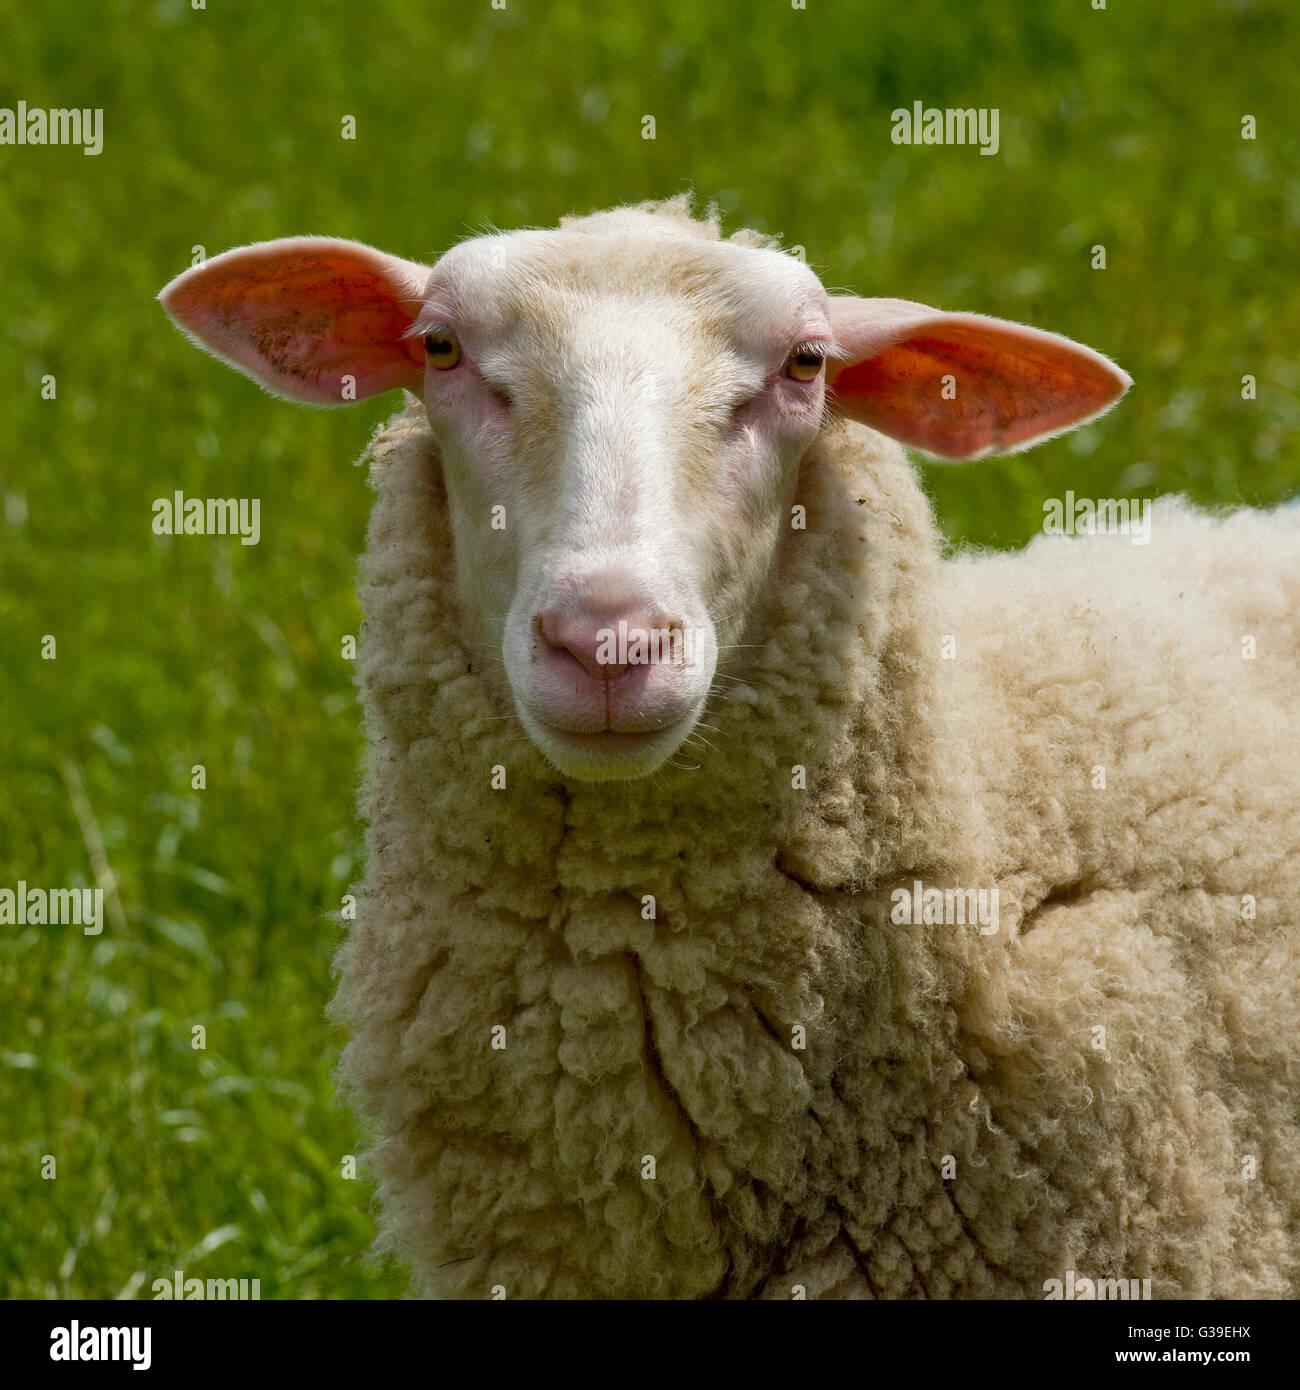 fresian sheep - Stock Image